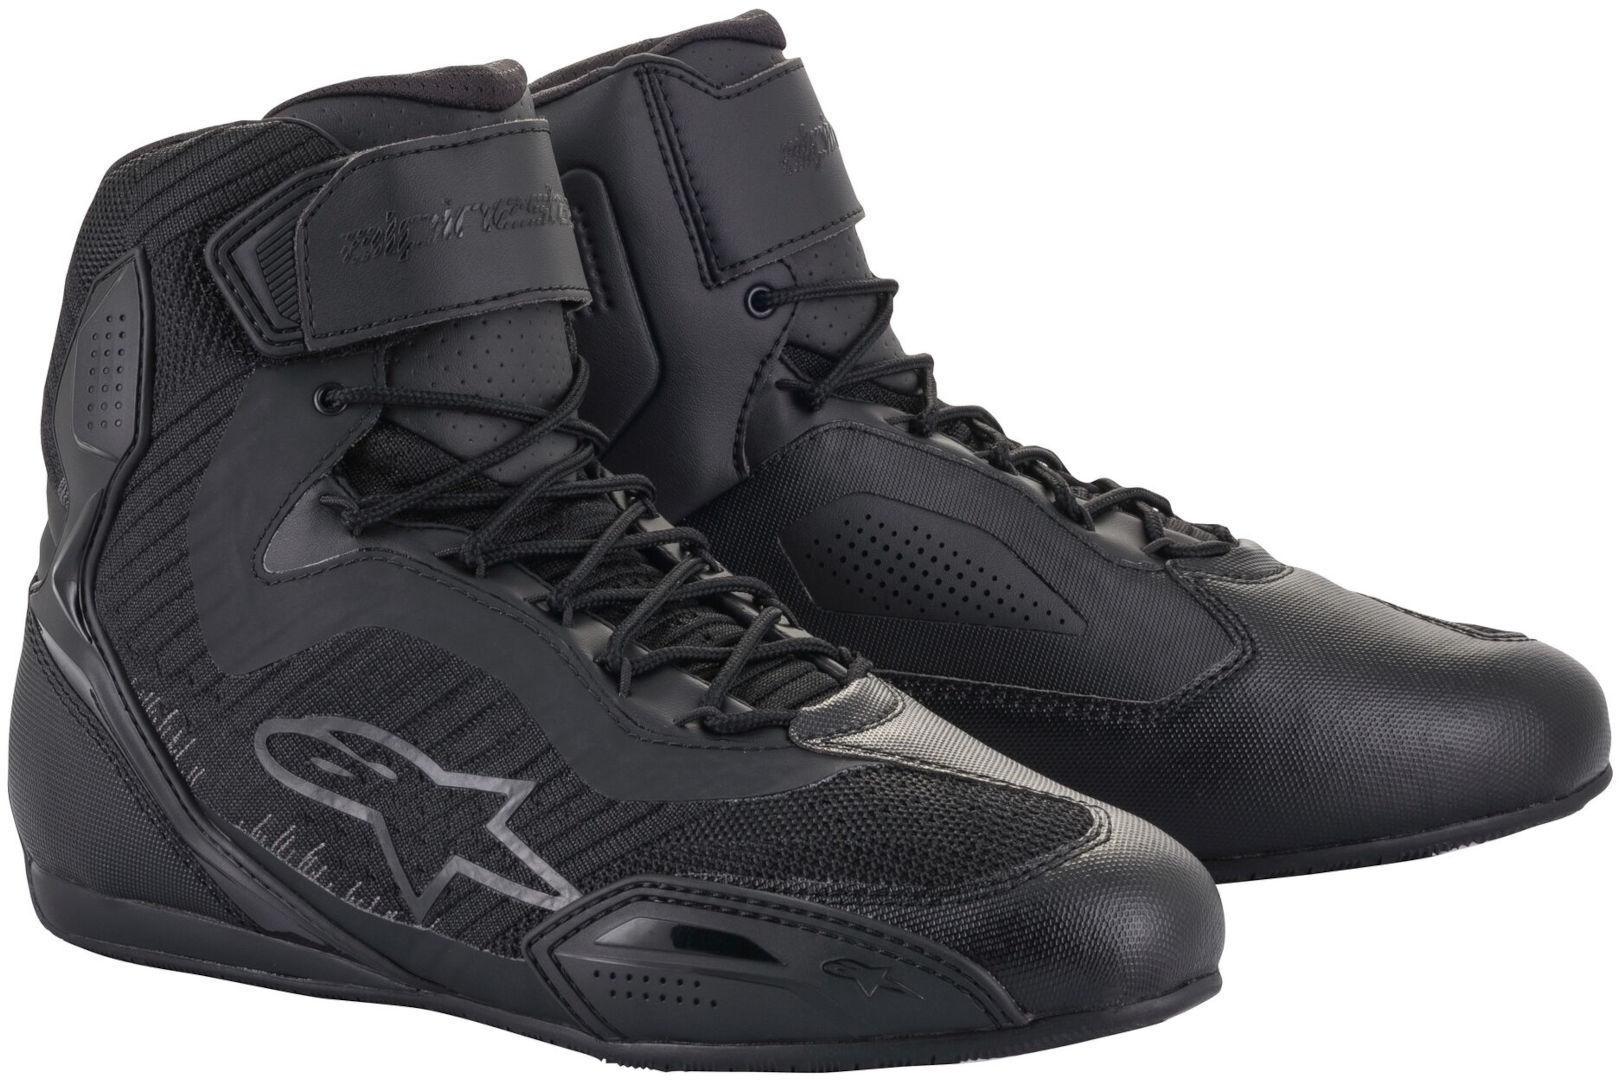 Alpinestars Stella Faster-3 Rideknit Chaussures de moto dames Noir Gris taille : 37 38